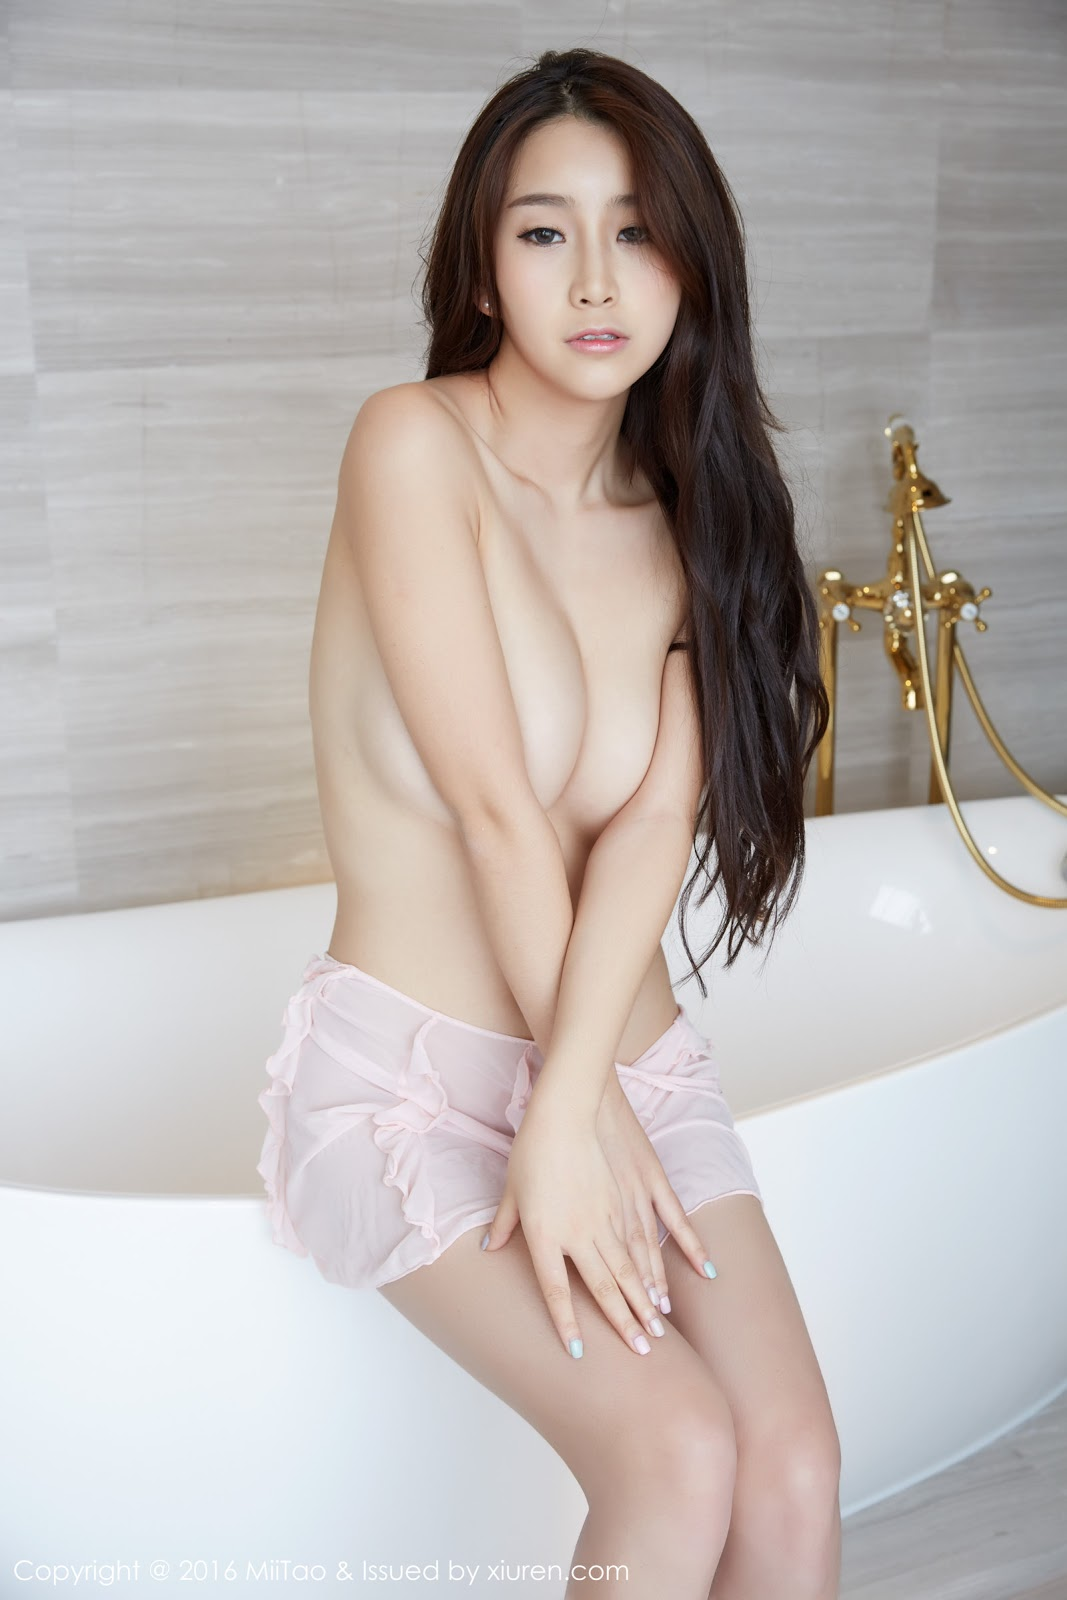 sexy-chinese-girl-gifs-sexy-women-pics-naked